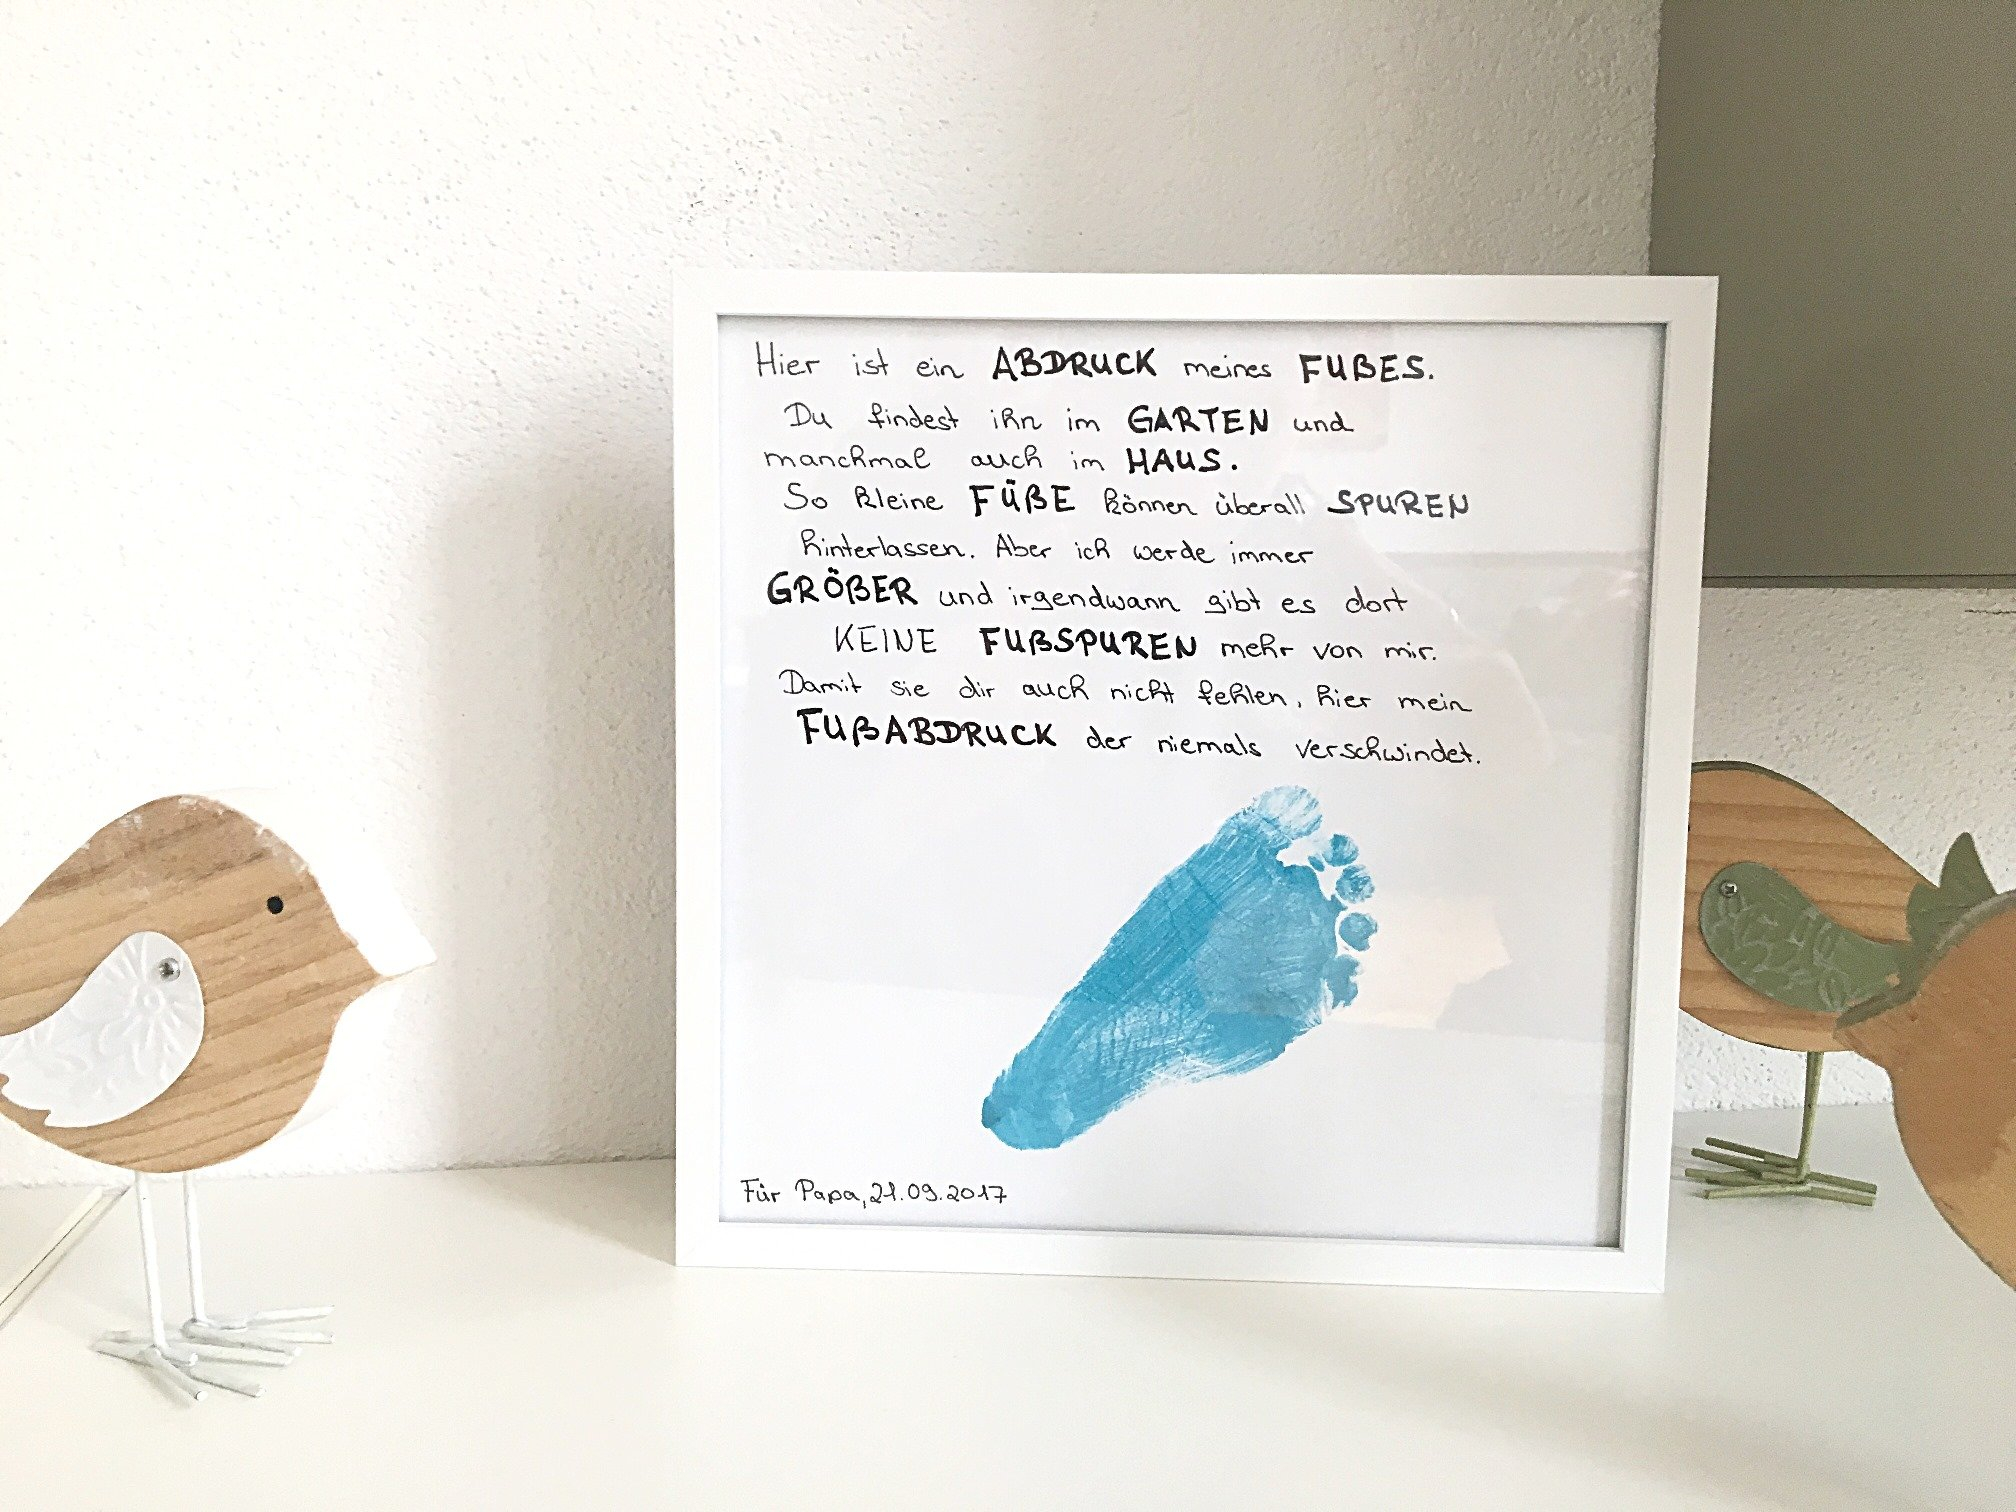 Foto 19.09.17 08 52 25 - Fußabdruck Baby/Kind als Geschenk, inklusive Anleitung